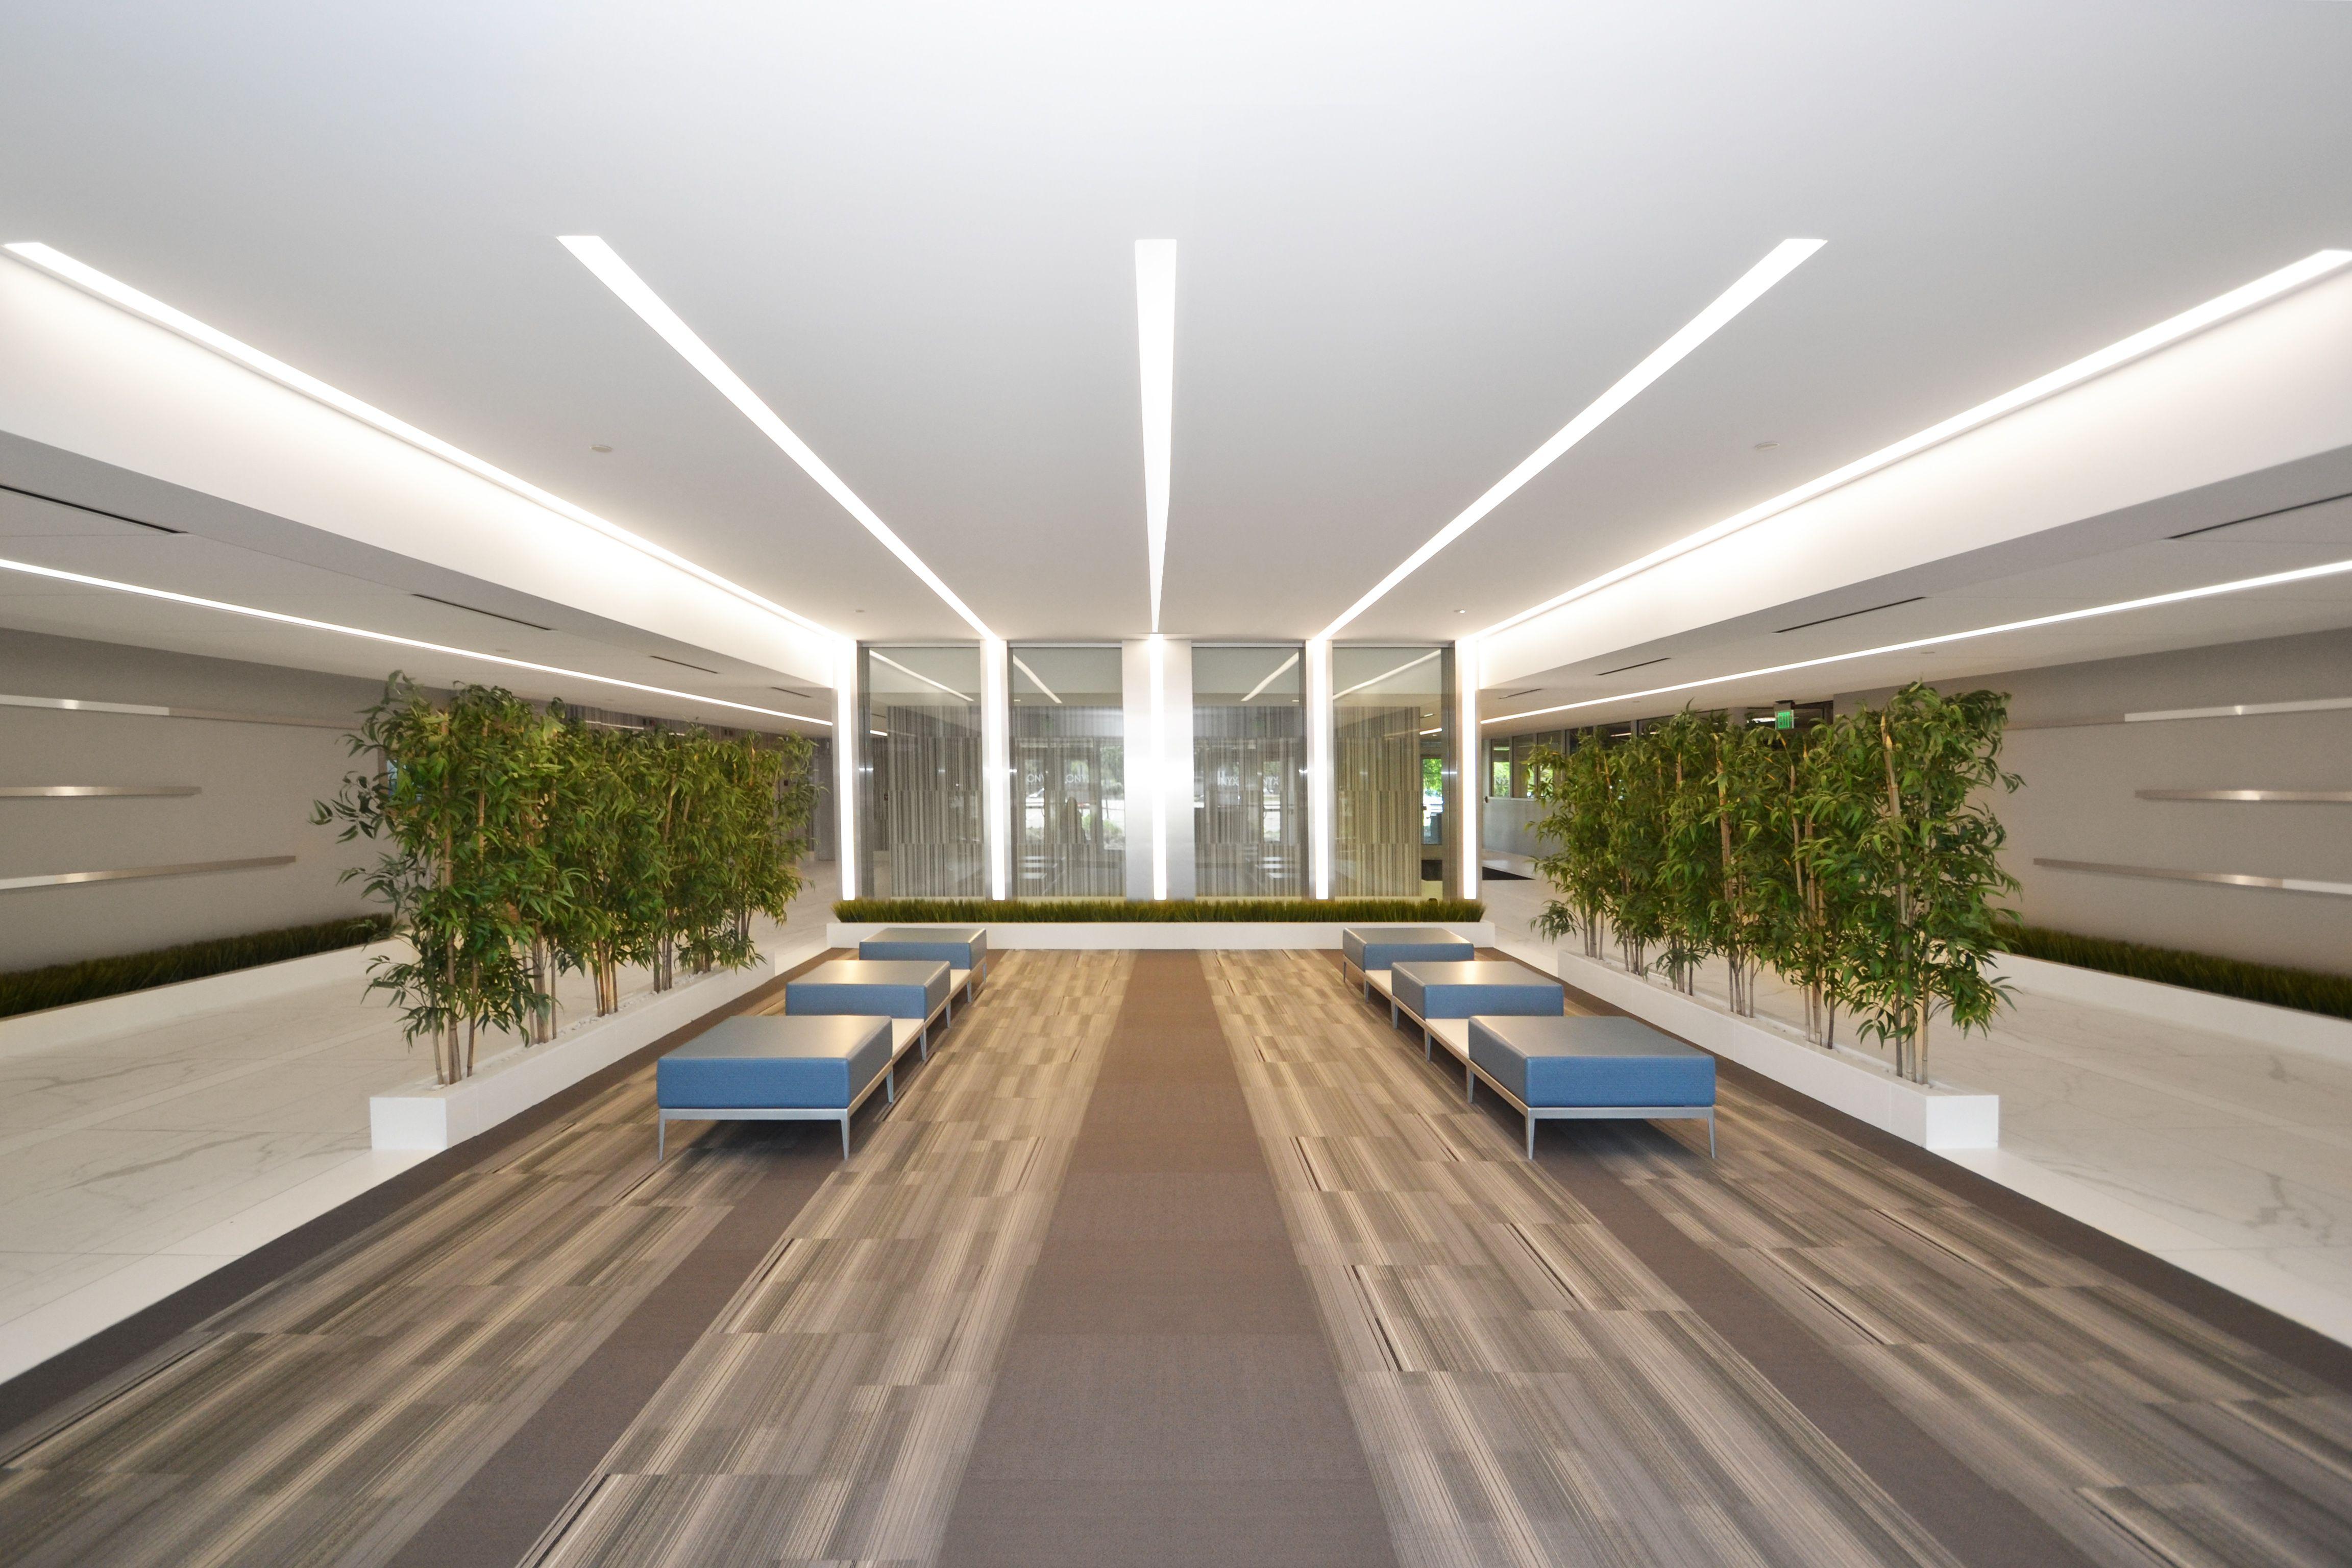 office lobby design ideas. Office Lobby Design Ideas. Marble, Marketing, Ceramic Floor Tiles, Modern Offices, Ideas